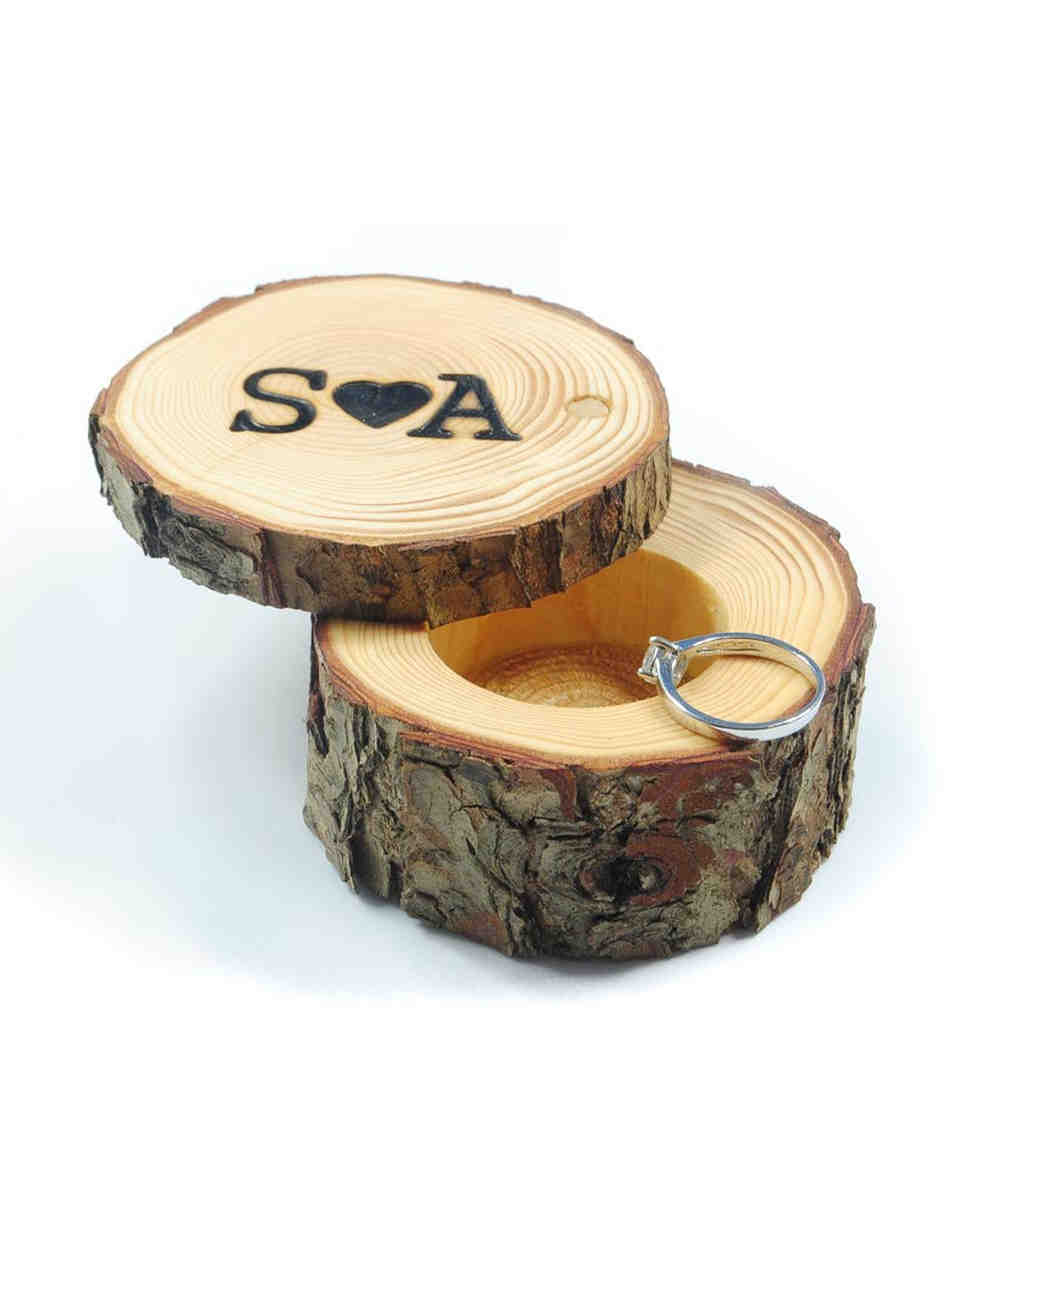 ring-boxes-mainebirchworks-rustic-birch-box-0115.jpg